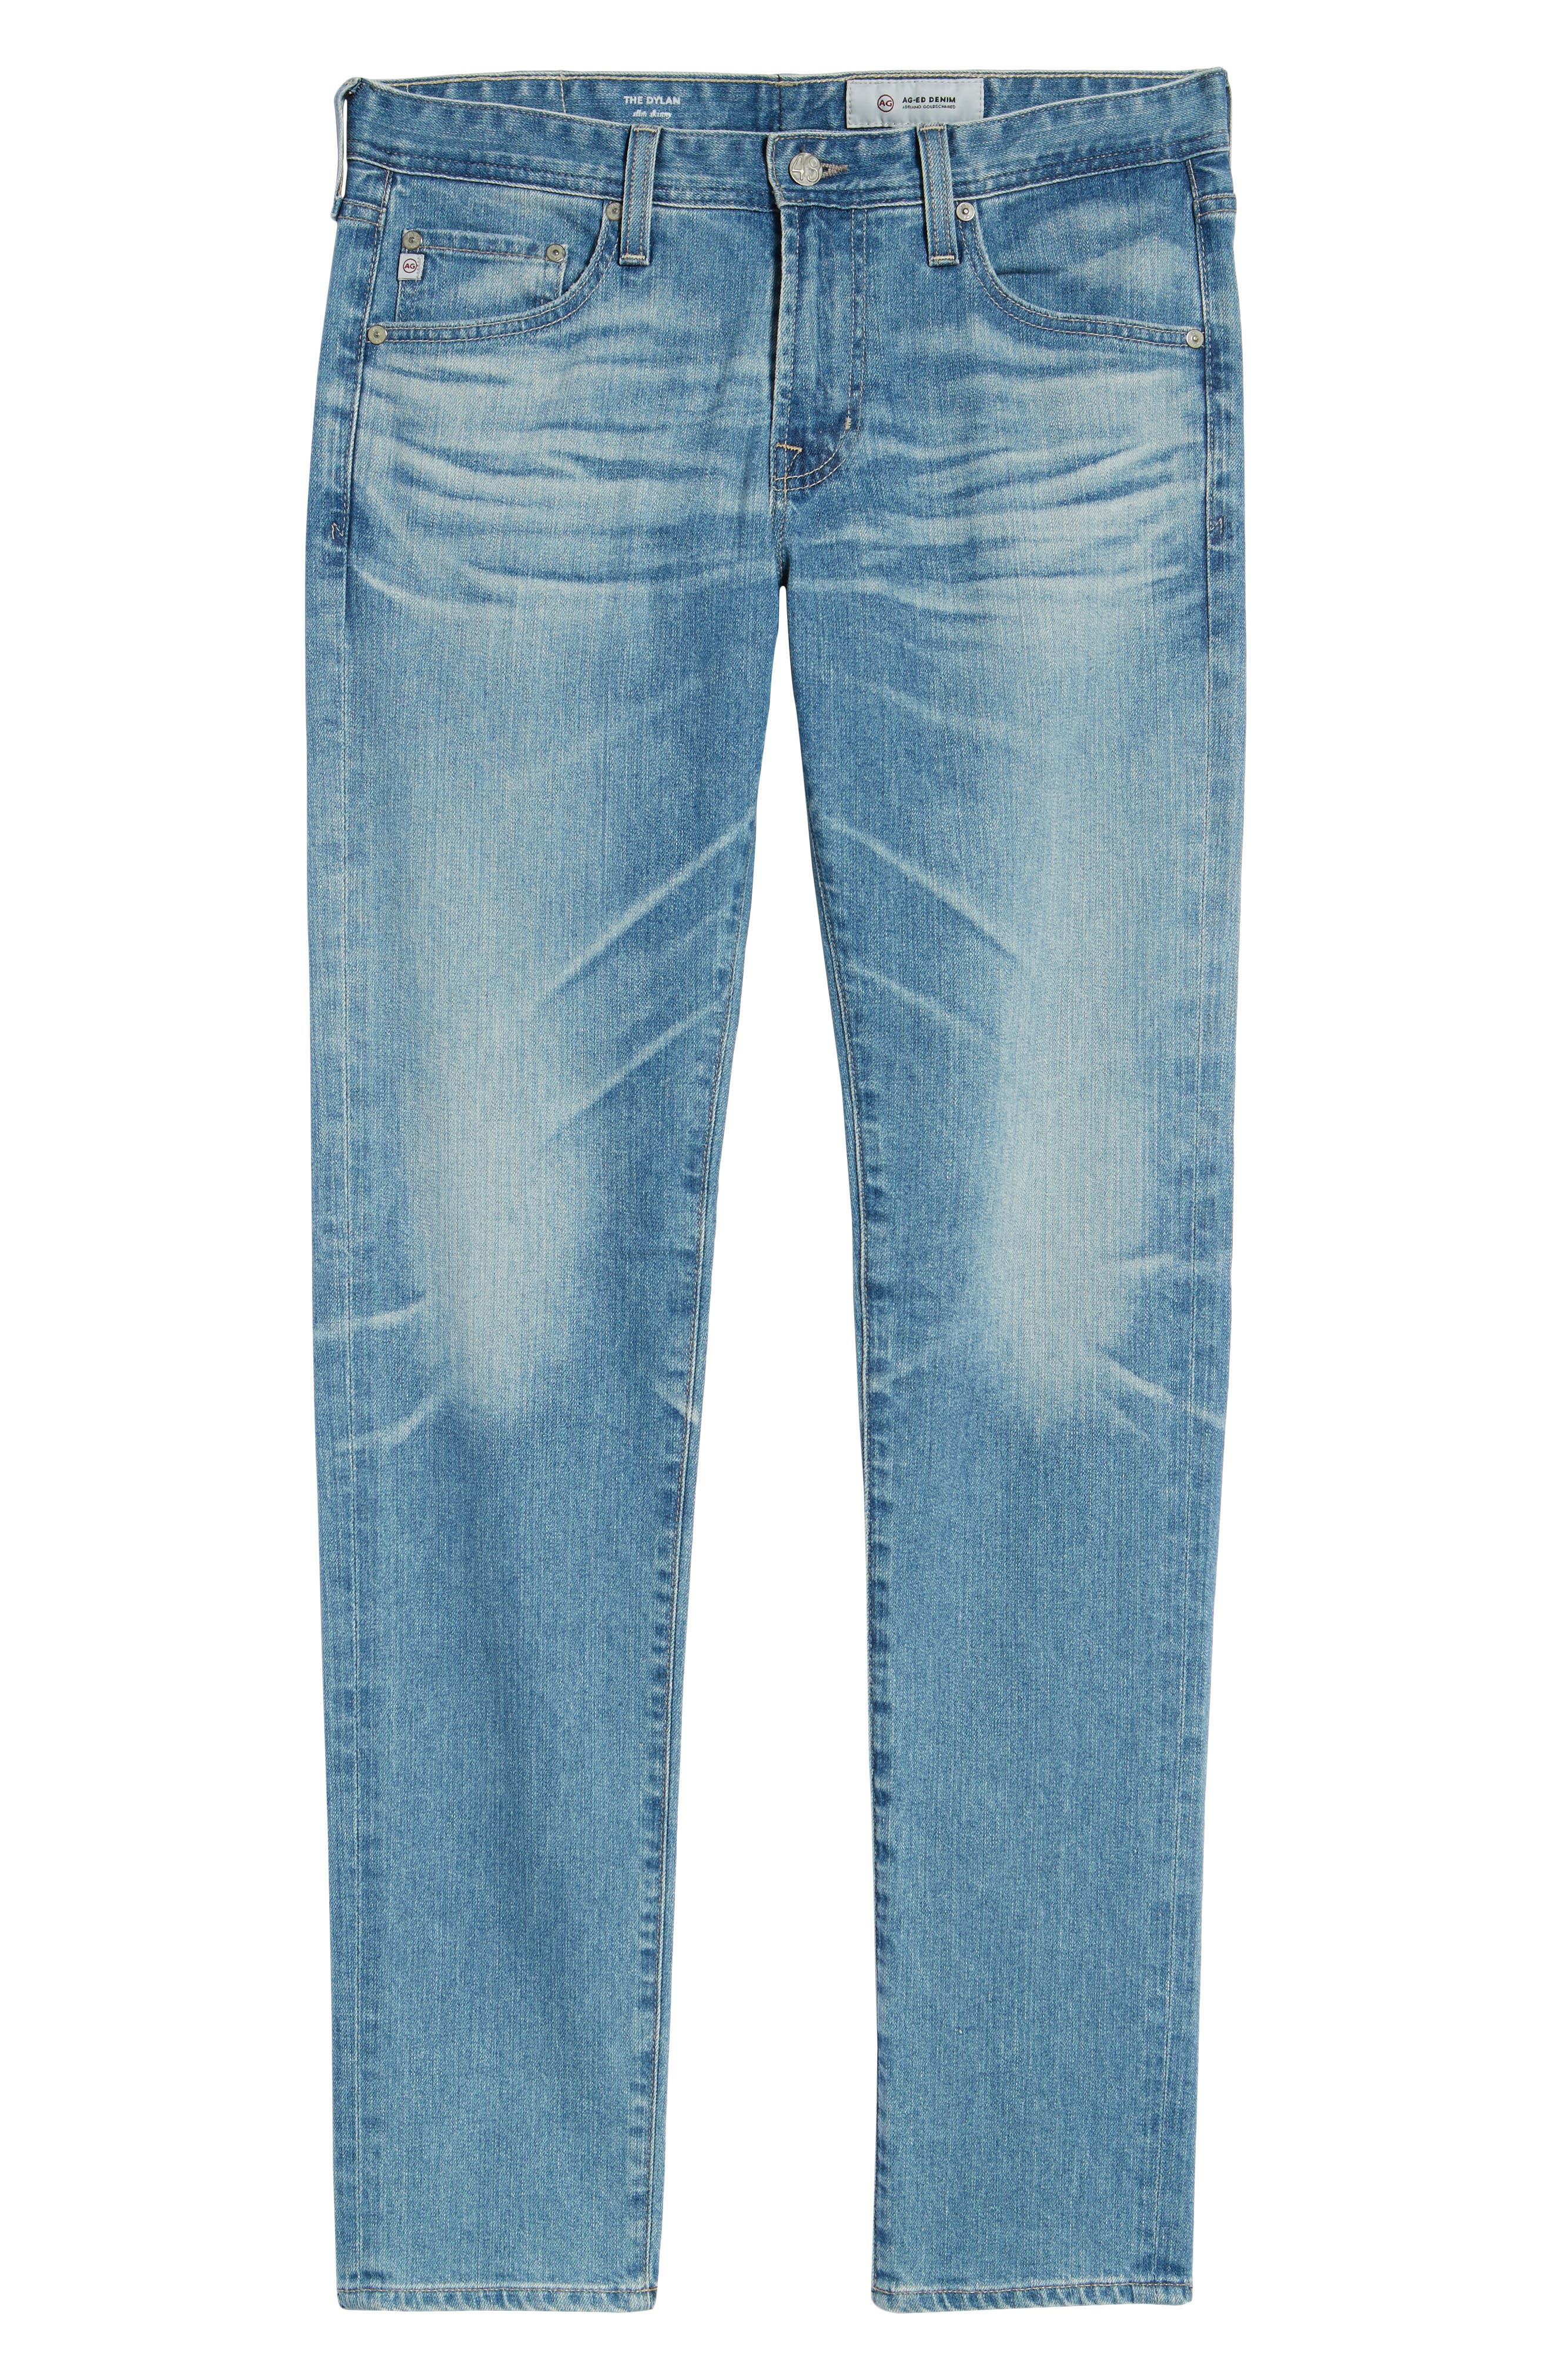 Dylan Skinny Fit Jeans,                             Alternate thumbnail 6, color,                             424